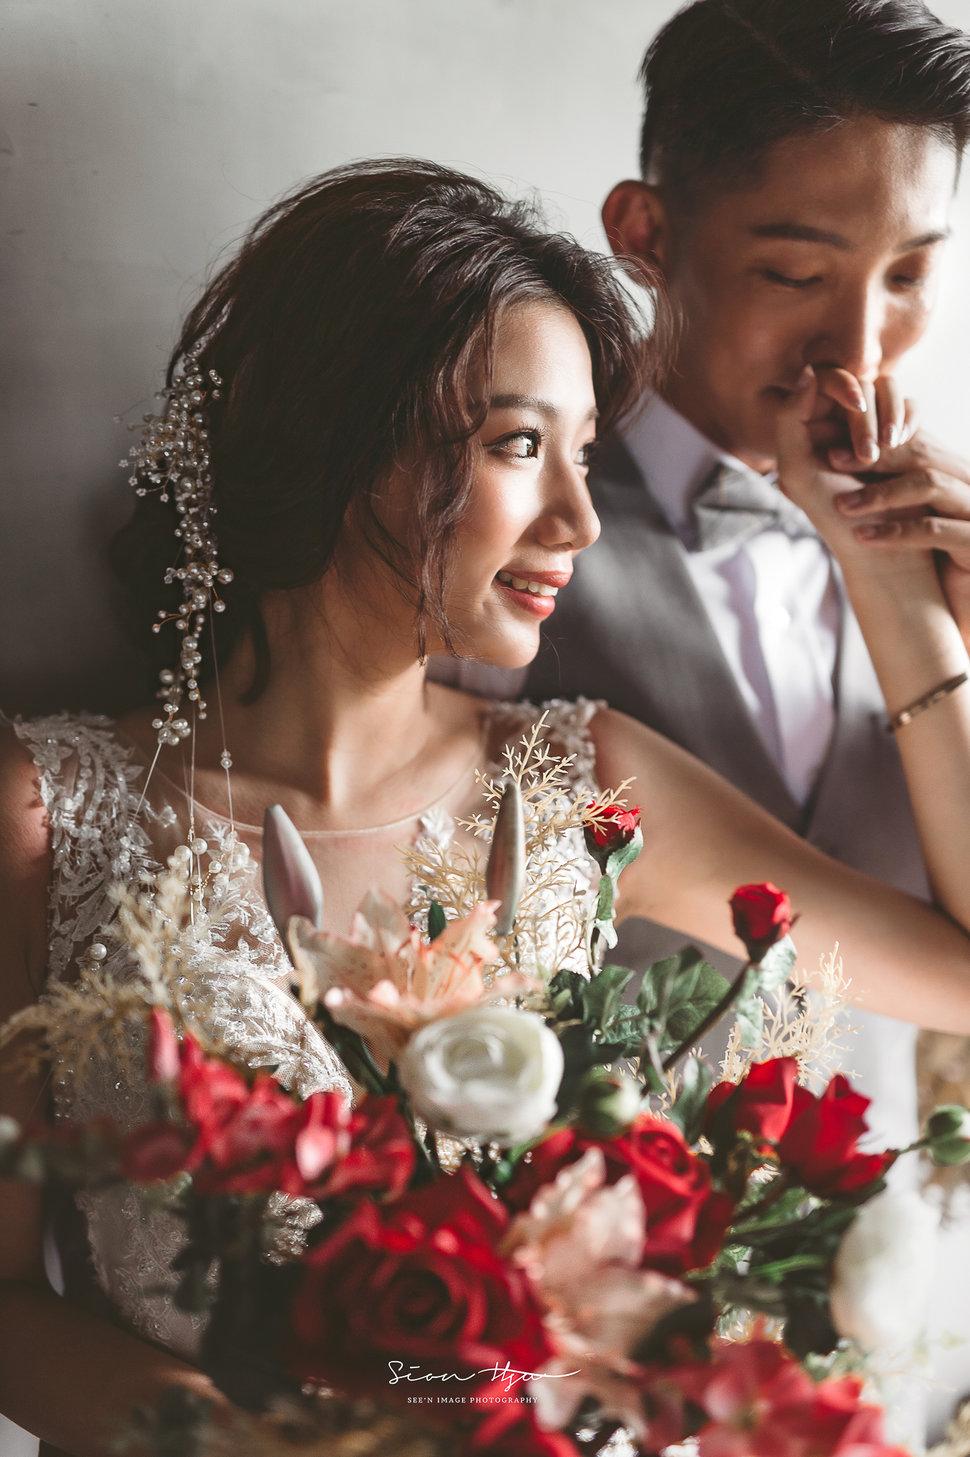 SEN_1221-編輯 - ABOUT PHOTO《結婚吧》